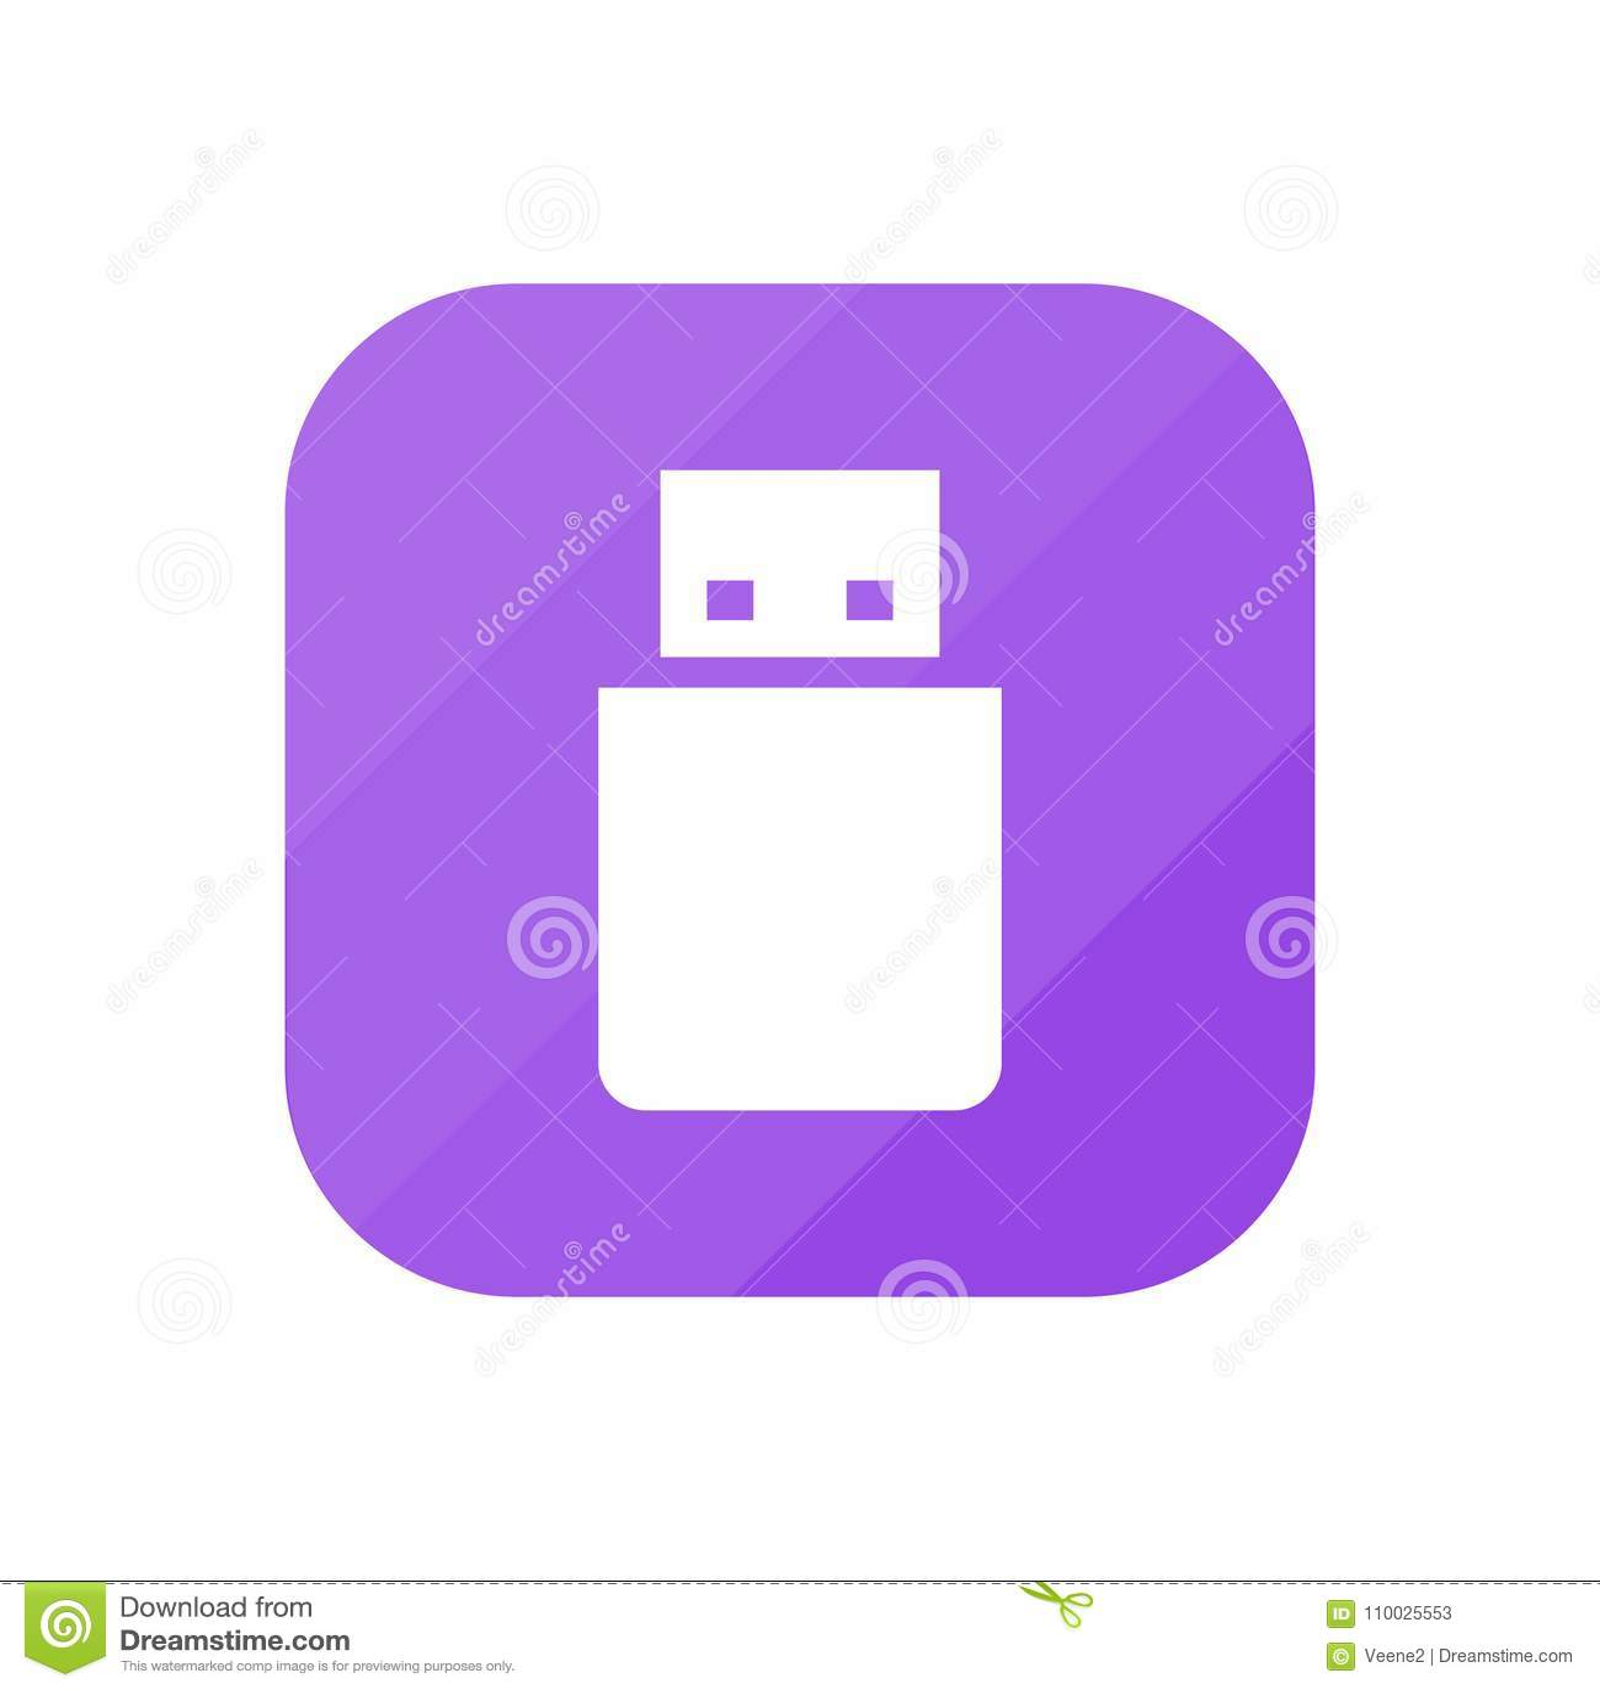 Flitsaandrijving, - App Pictogram